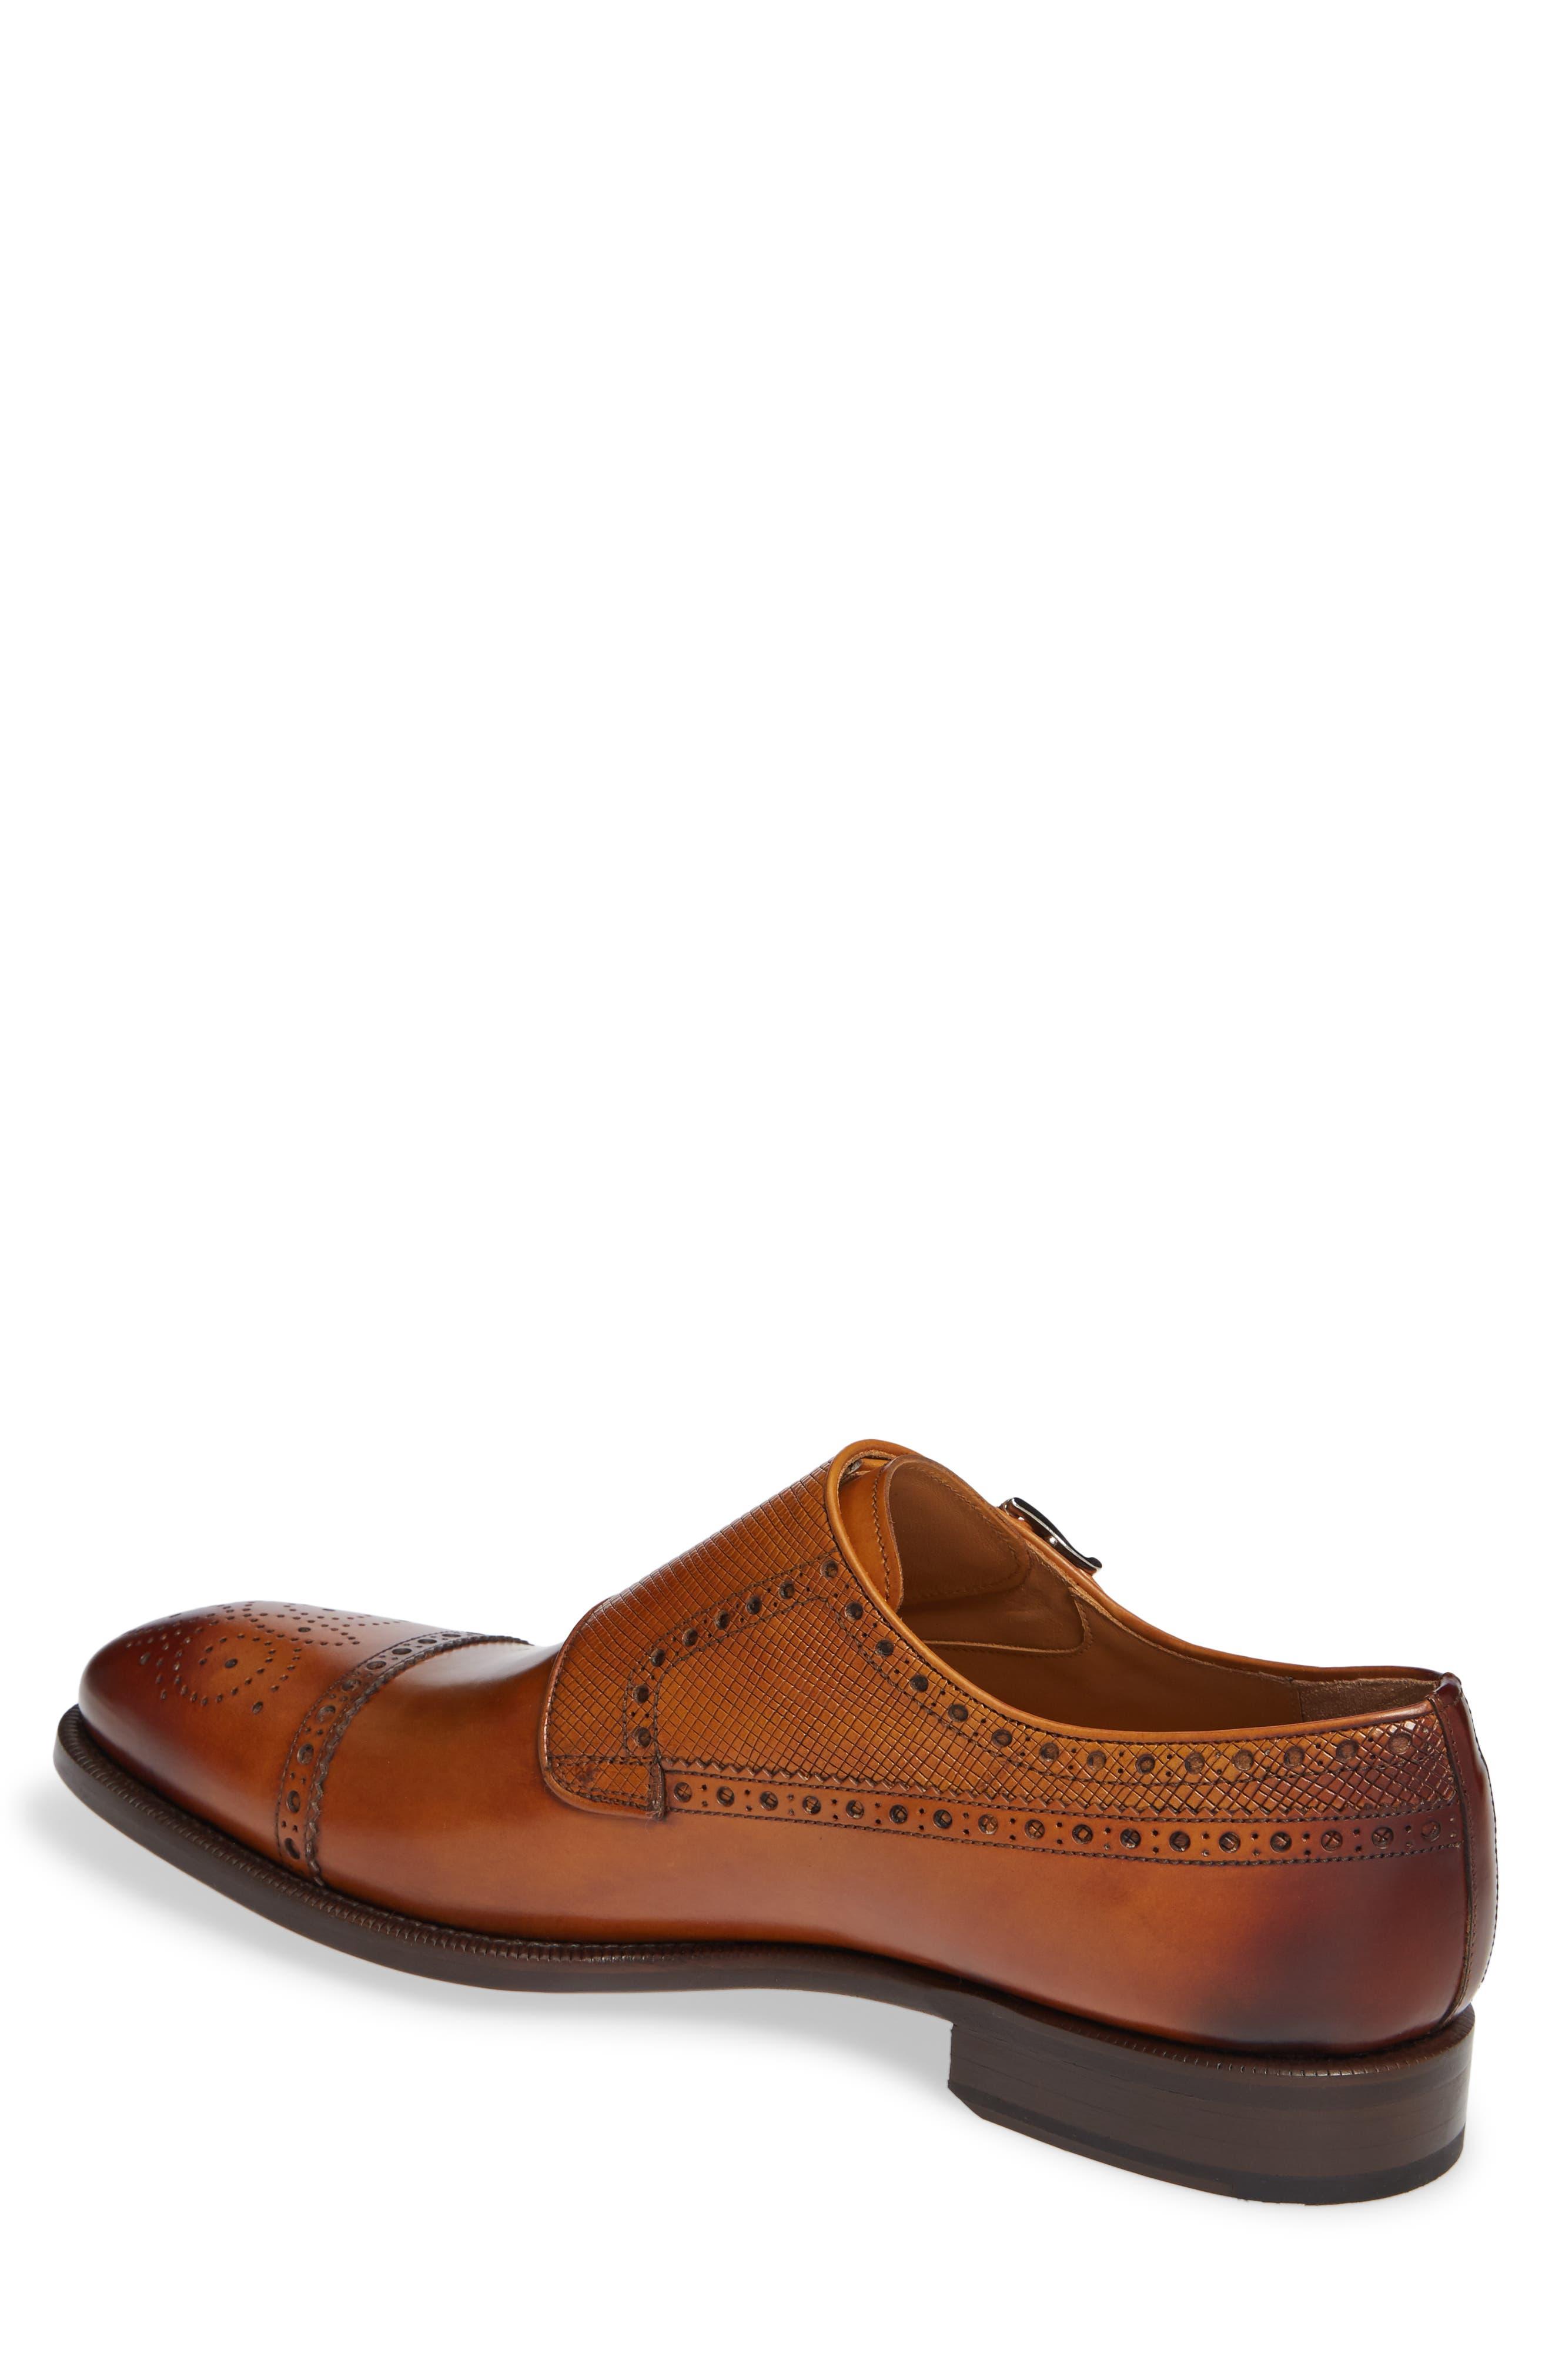 Valda Double Strap Cap Toe Monk Shoe,                             Alternate thumbnail 2, color,                             BROWN LEATHER